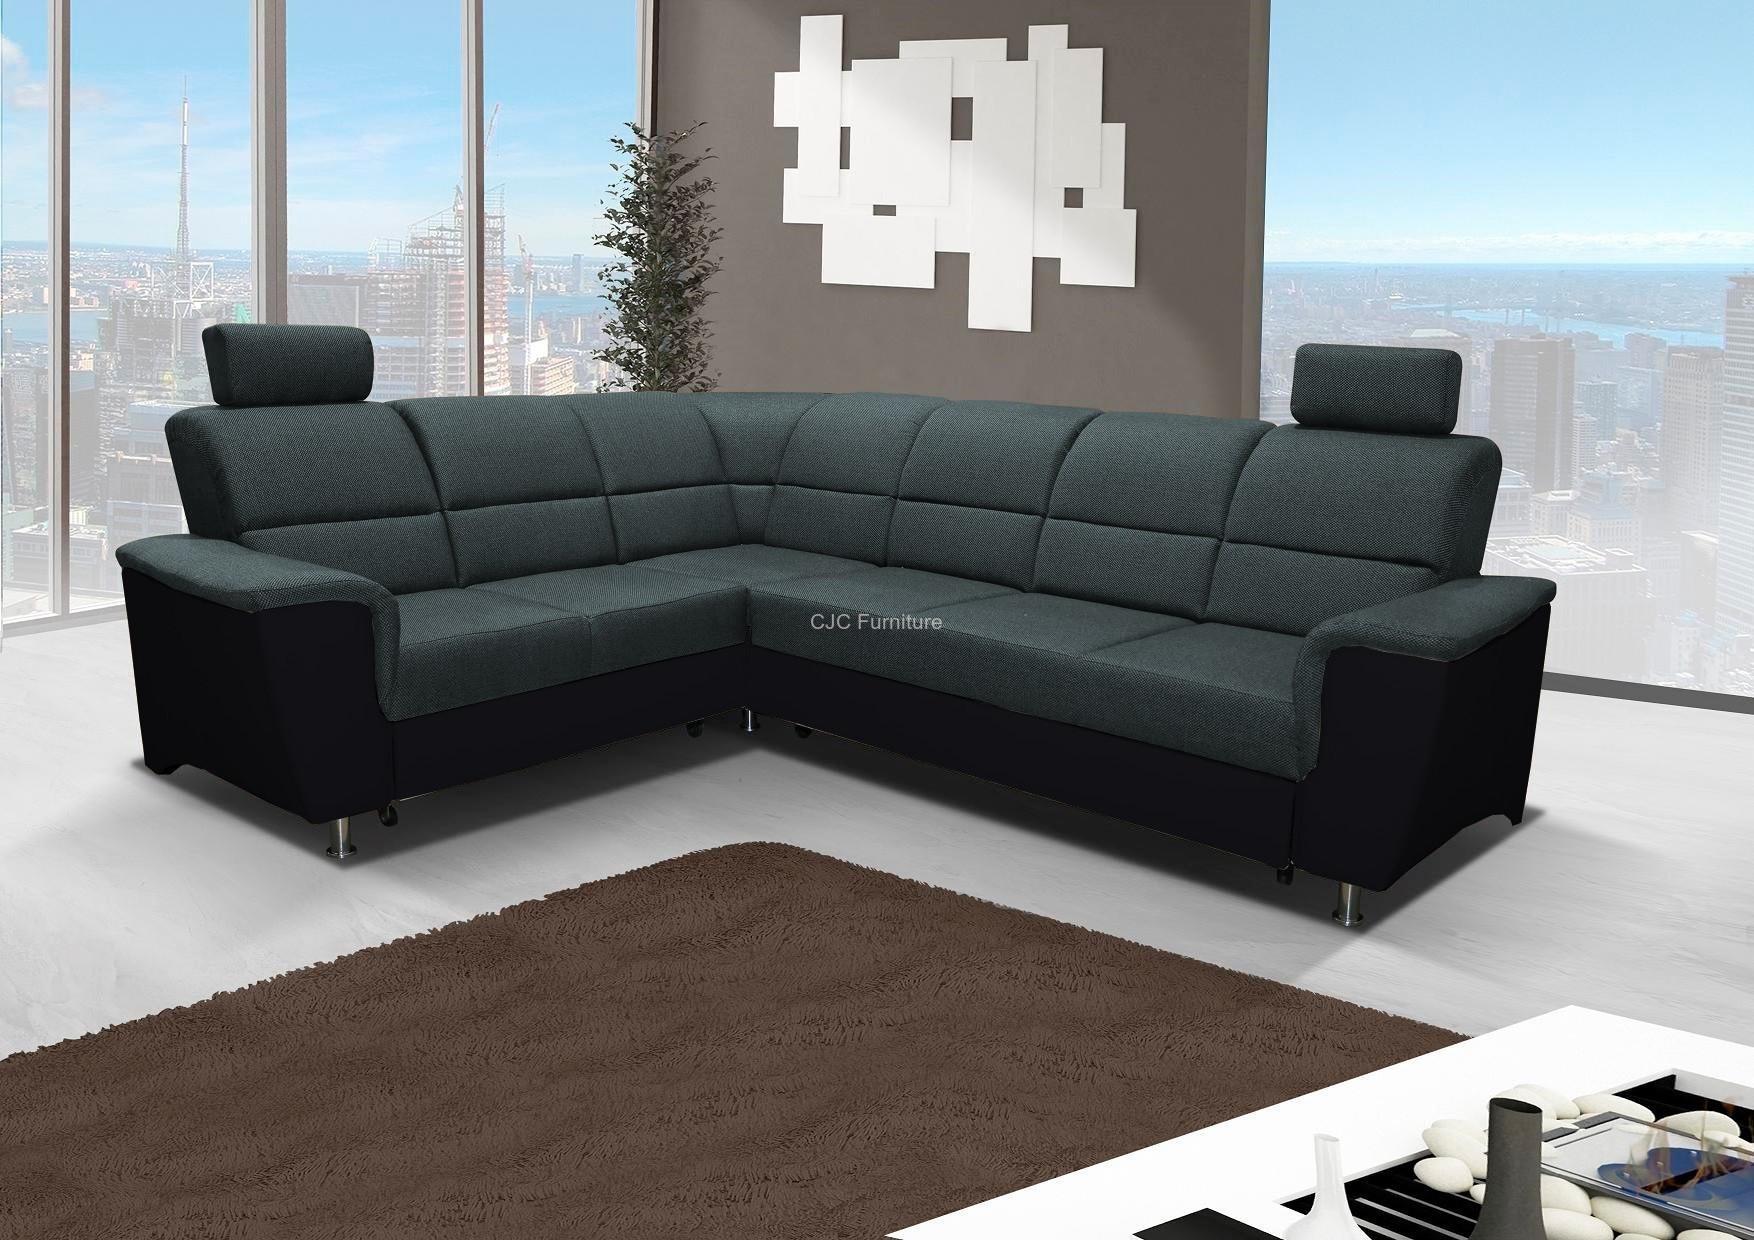 sofa sleeper san francisco compact with storage 20 best diego sofas ideas